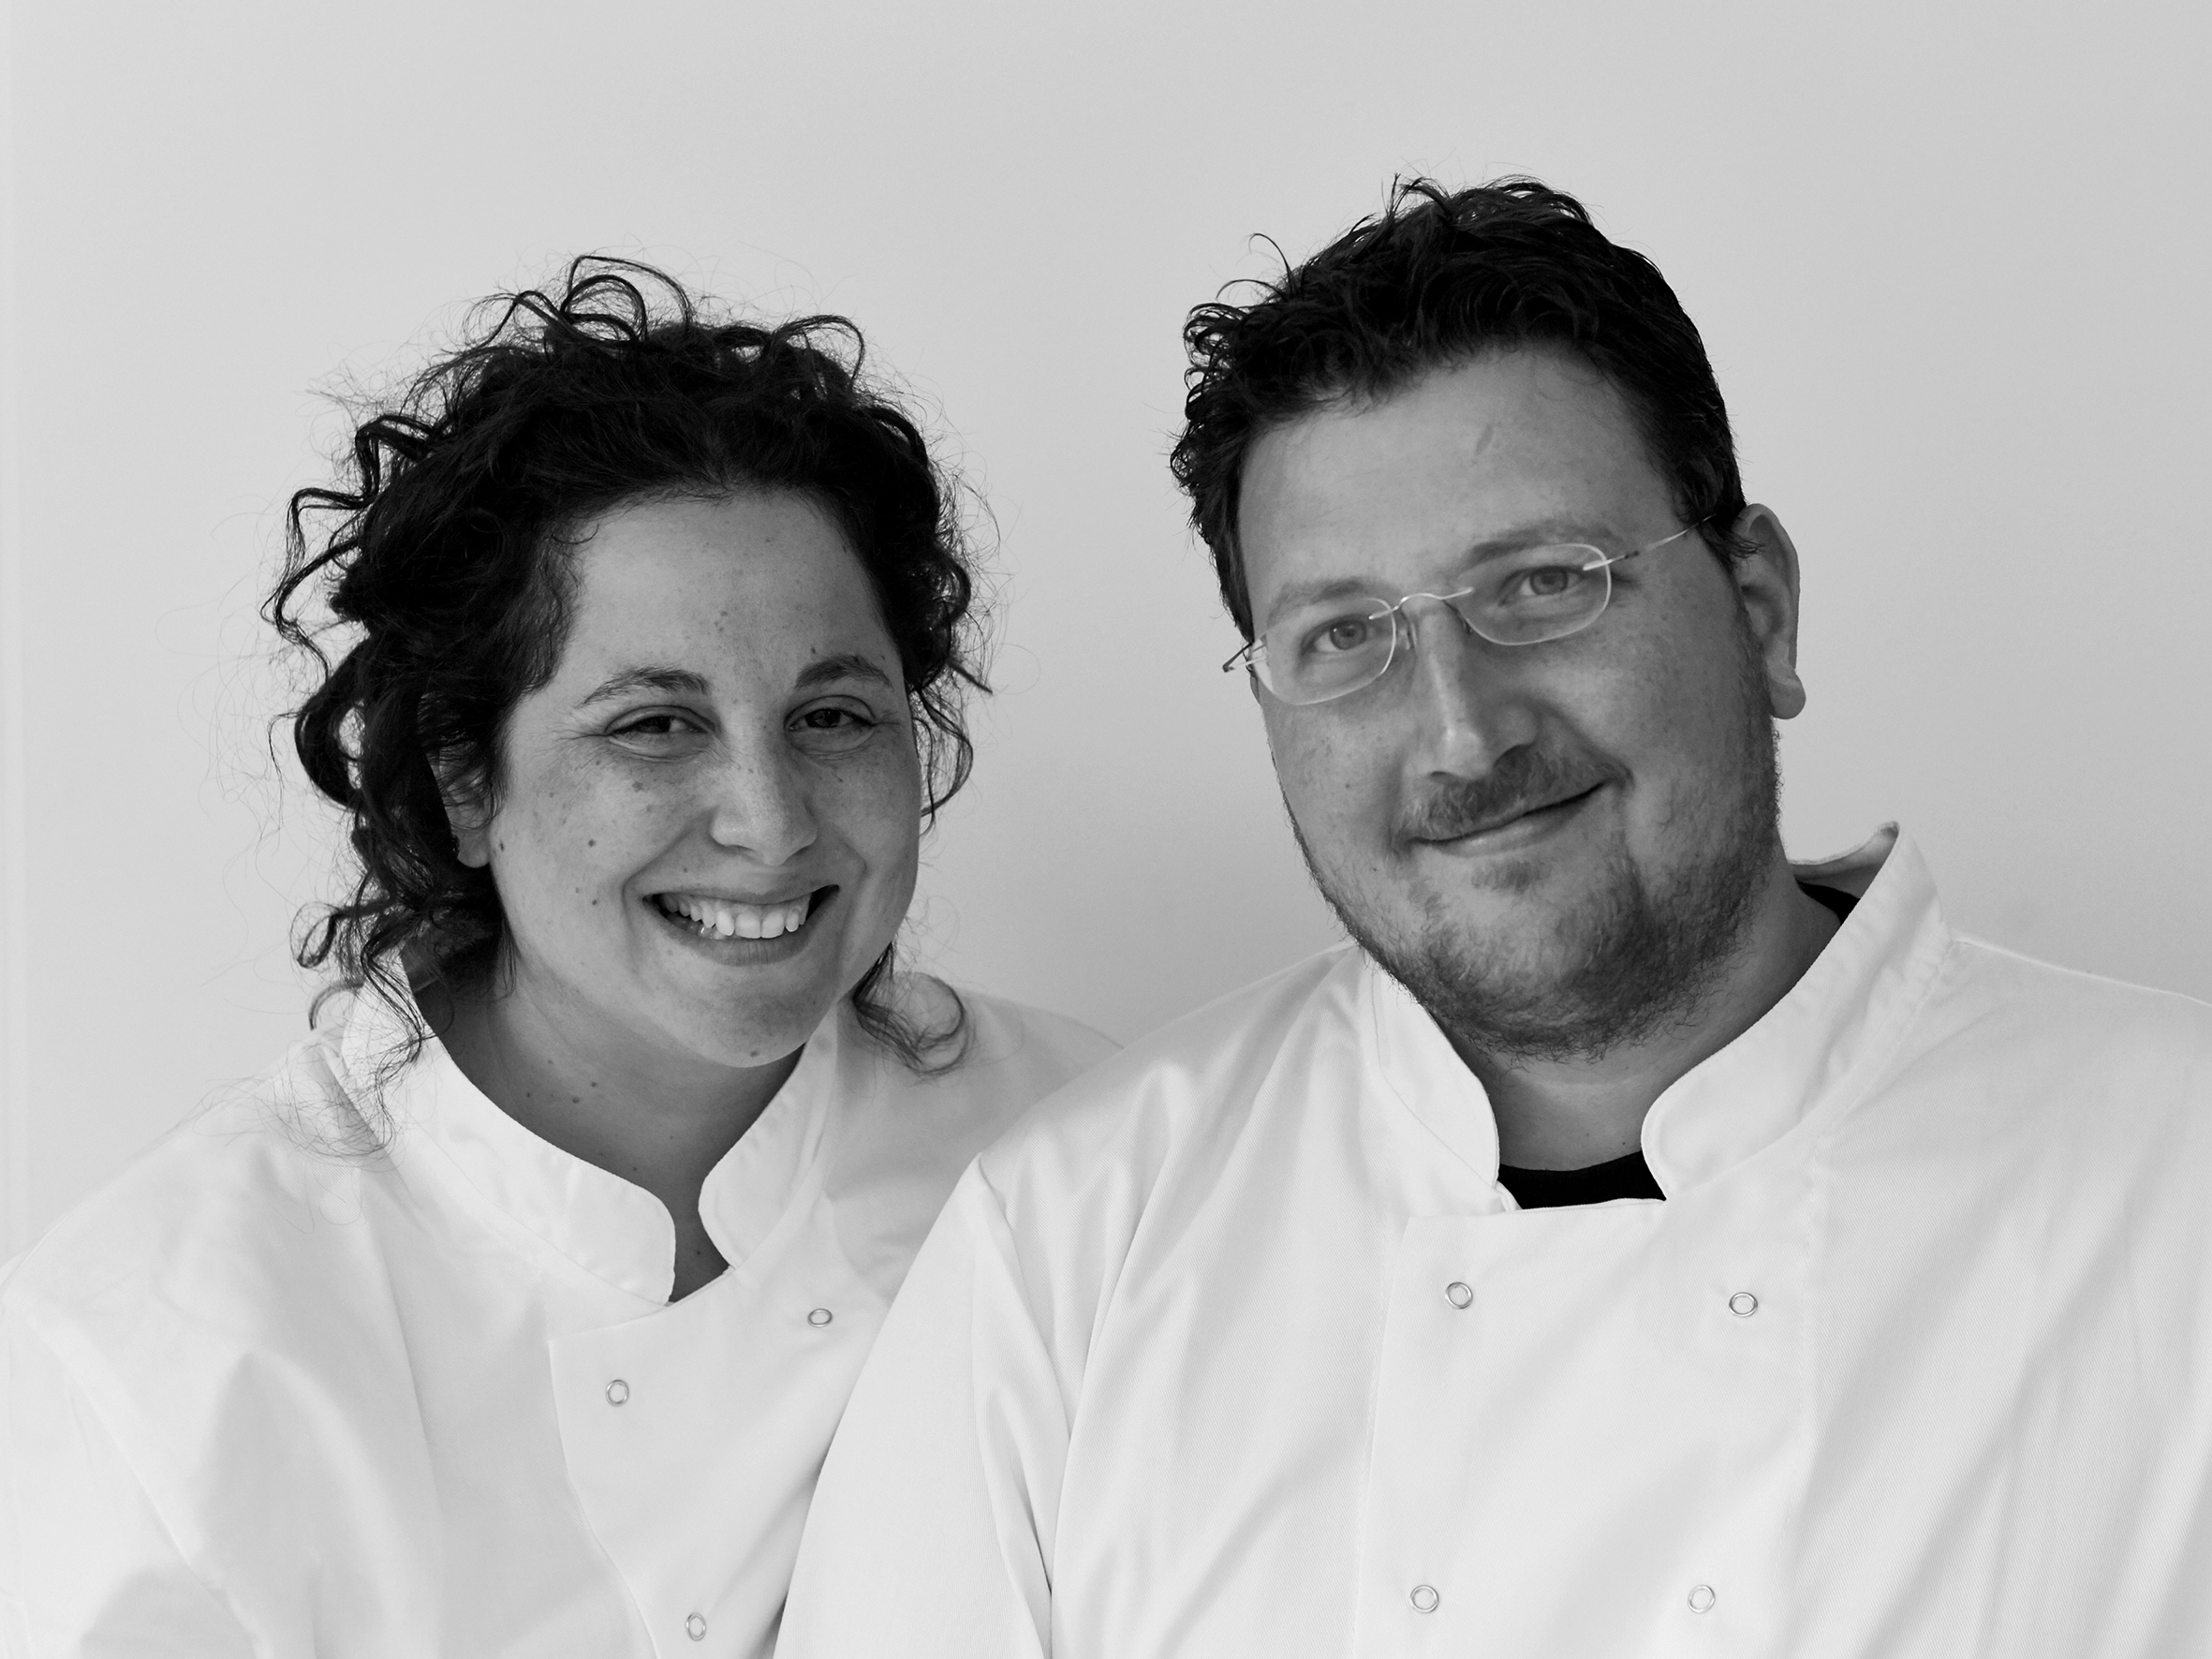 Sarit Packer and Itamar Srulovich